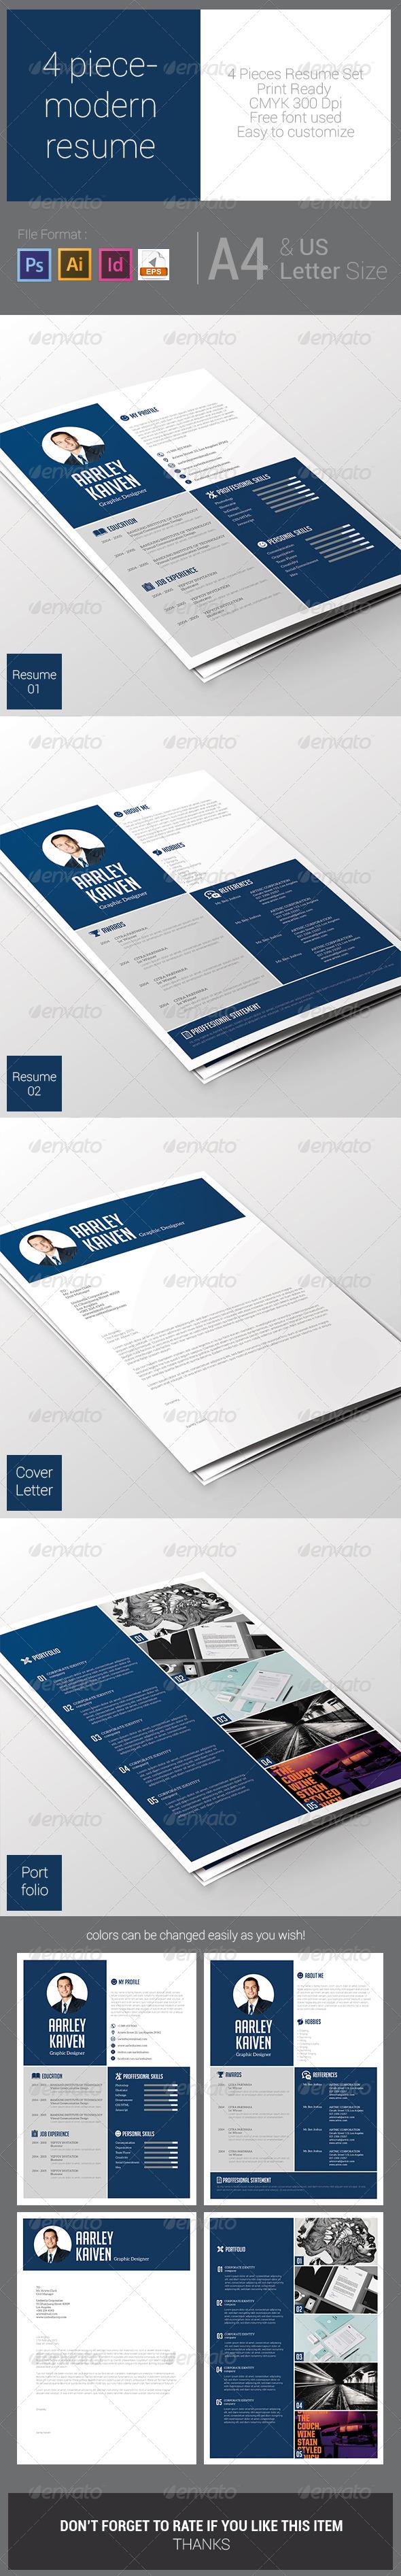 GraphicRiver 4 Piece-Modern Resume 8125837